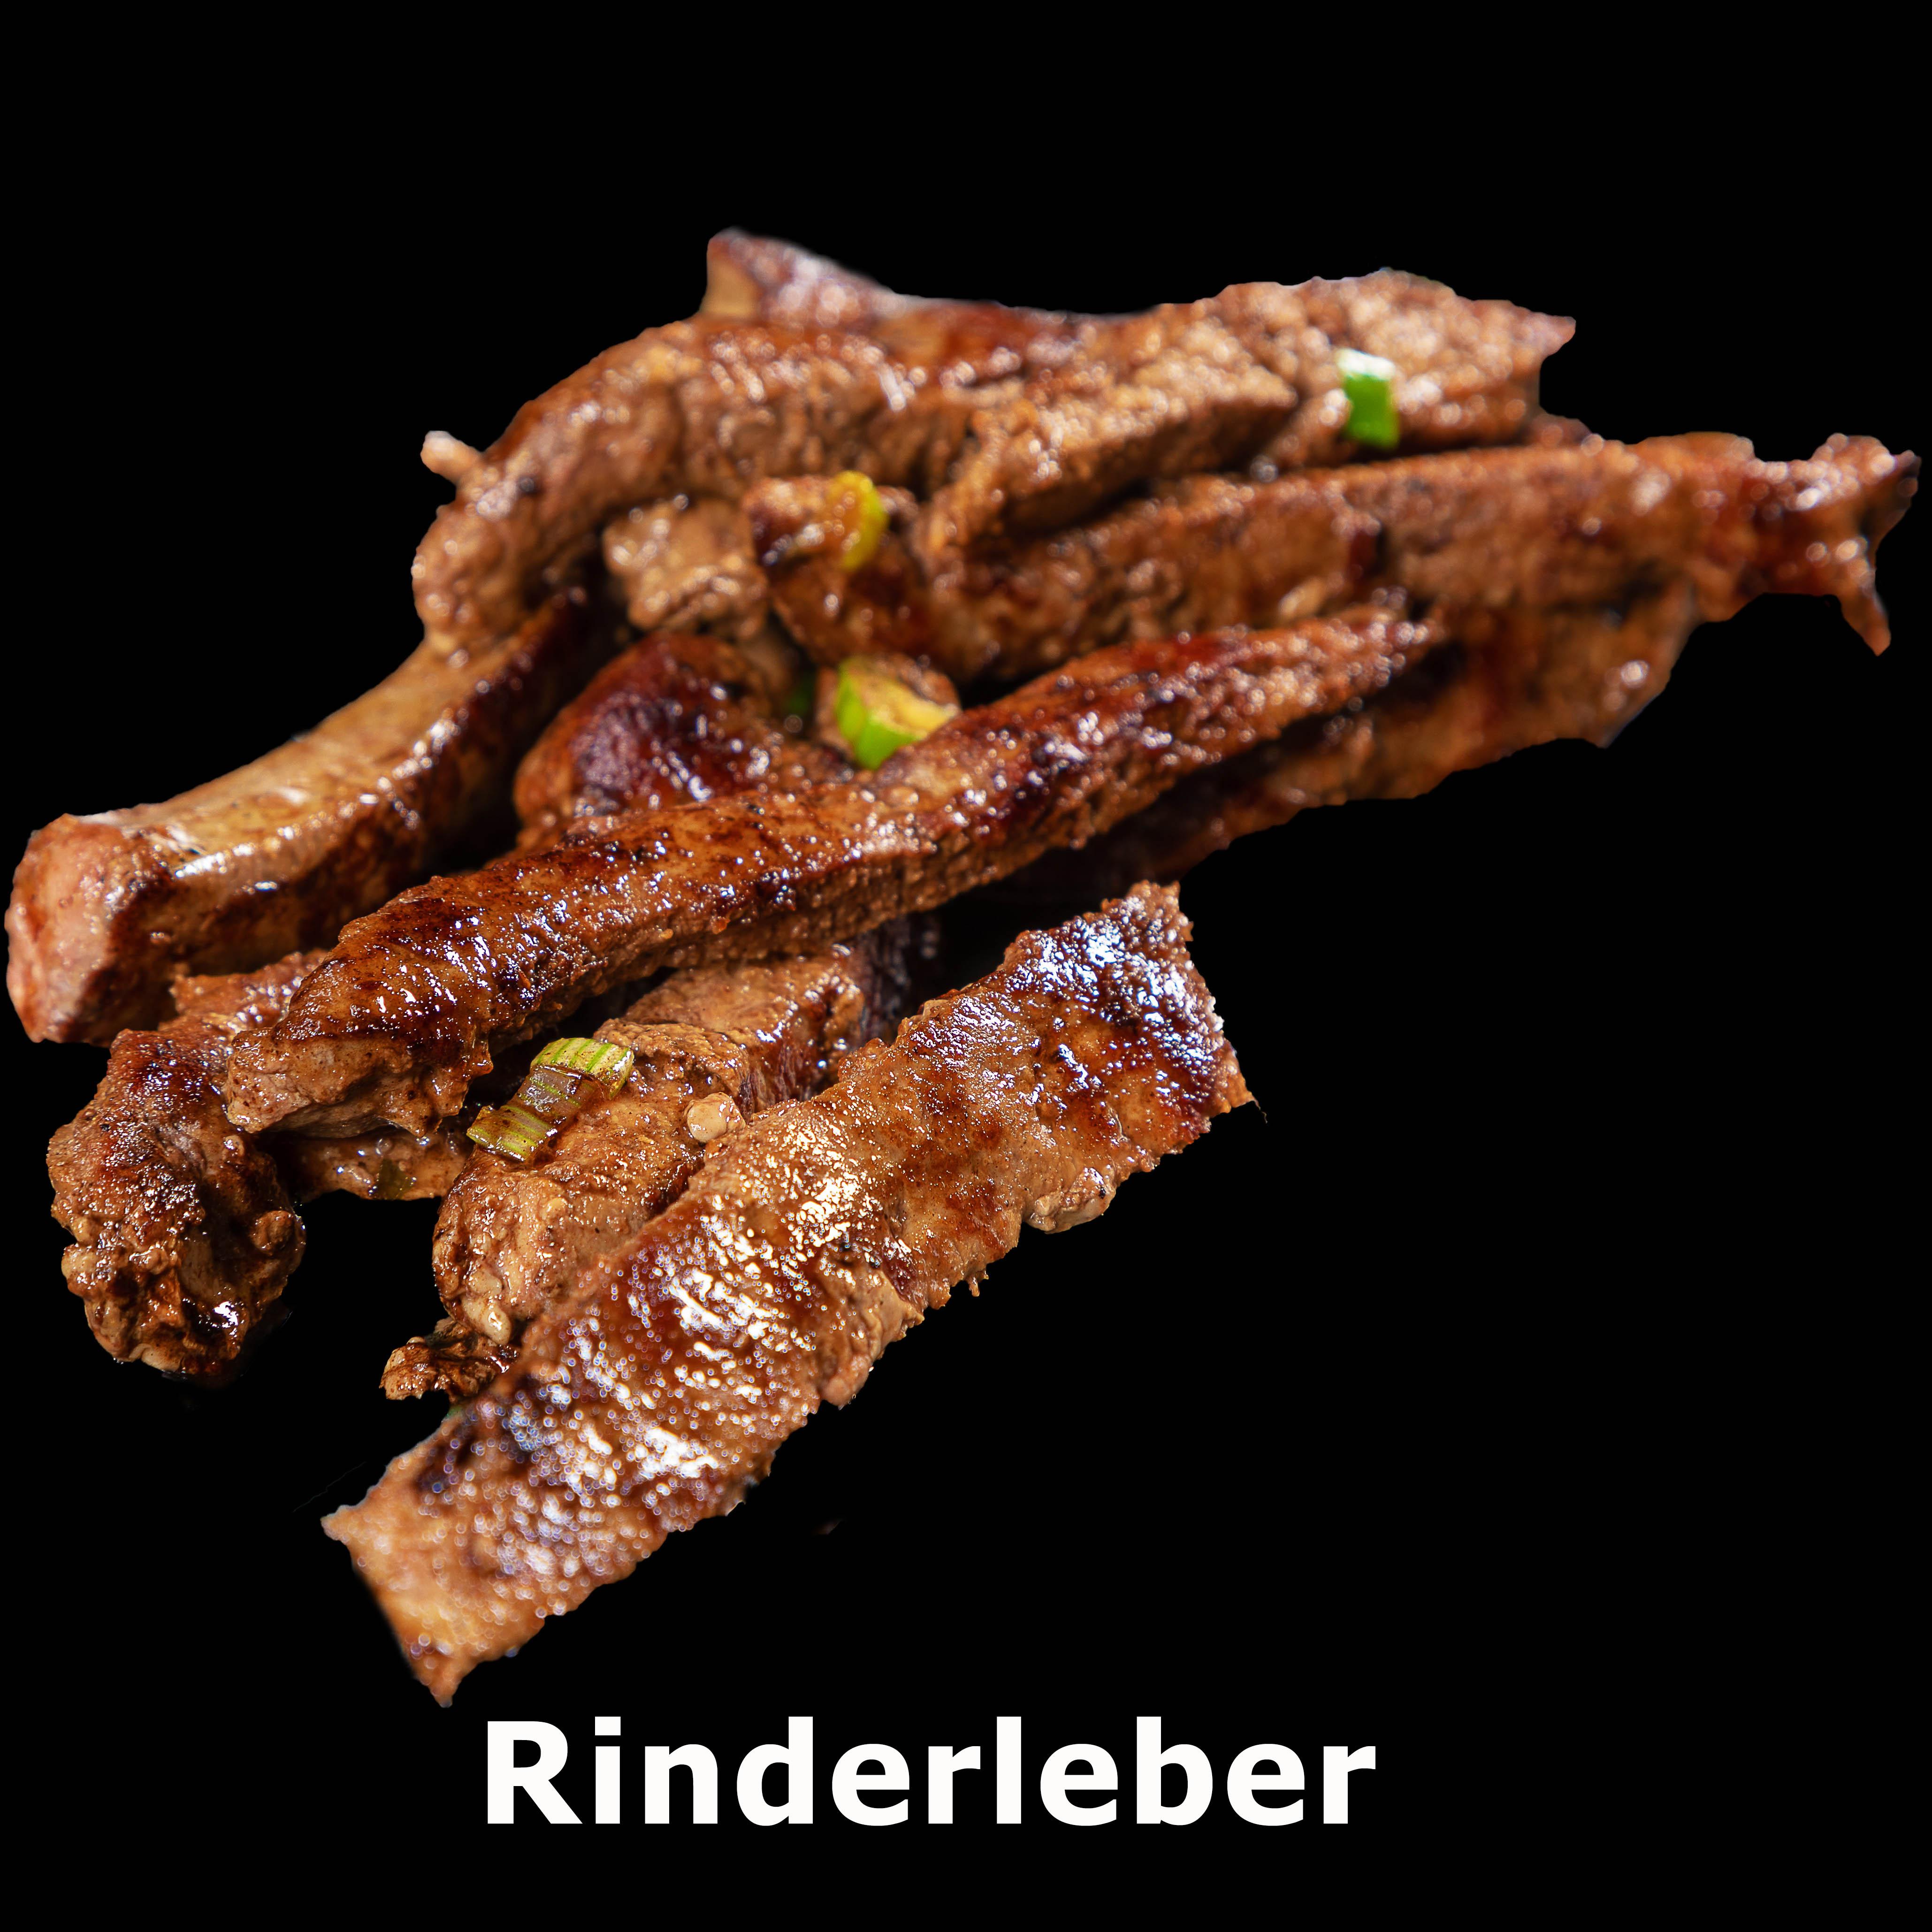 142. Rinderleber